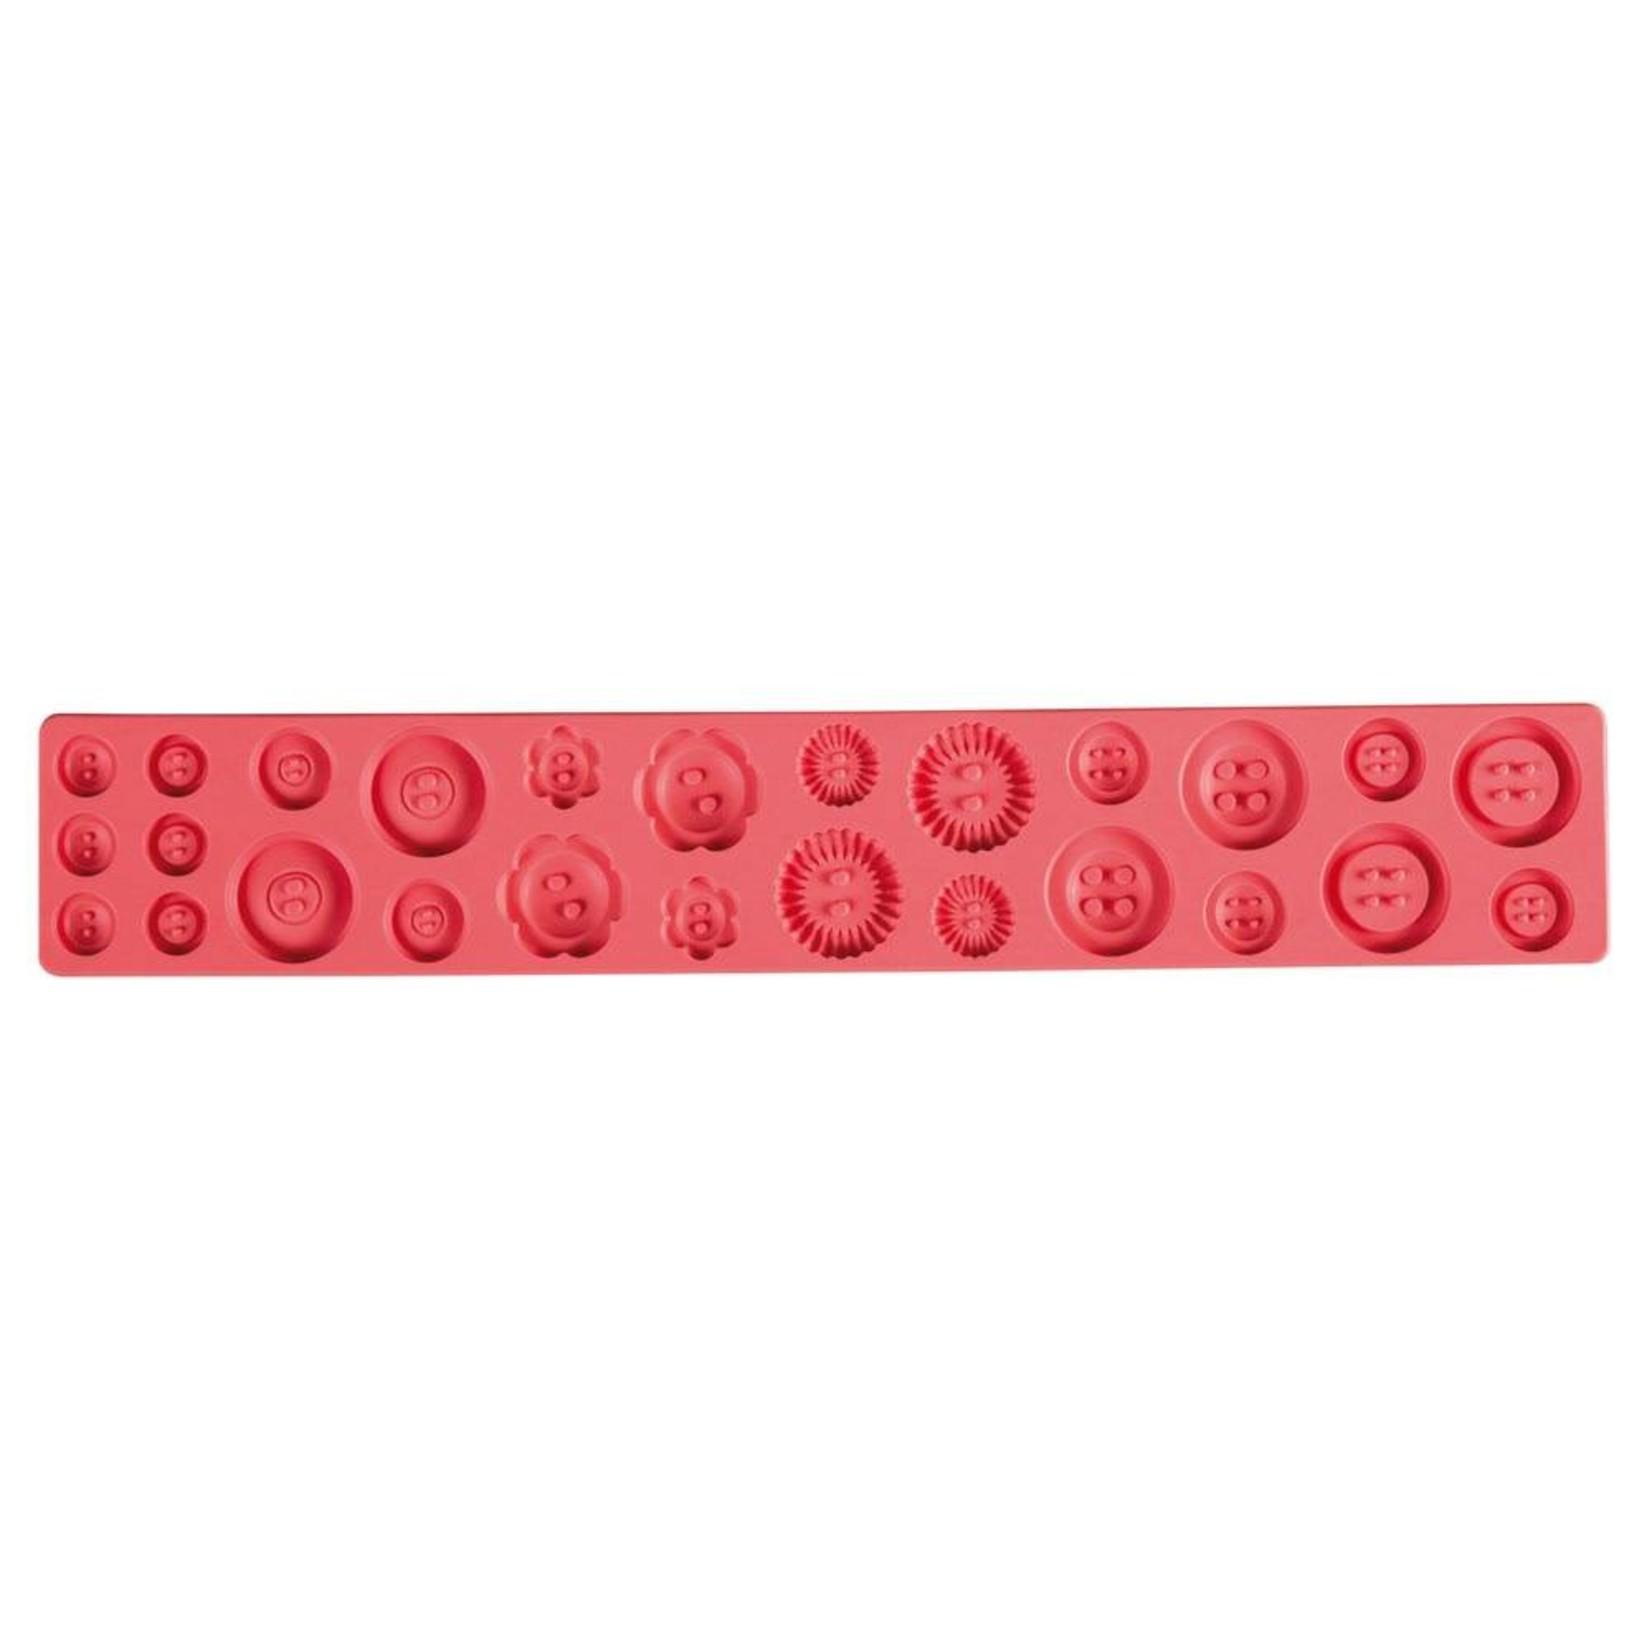 Pavoni Pavoni - Decorative silicone border mold, ST16